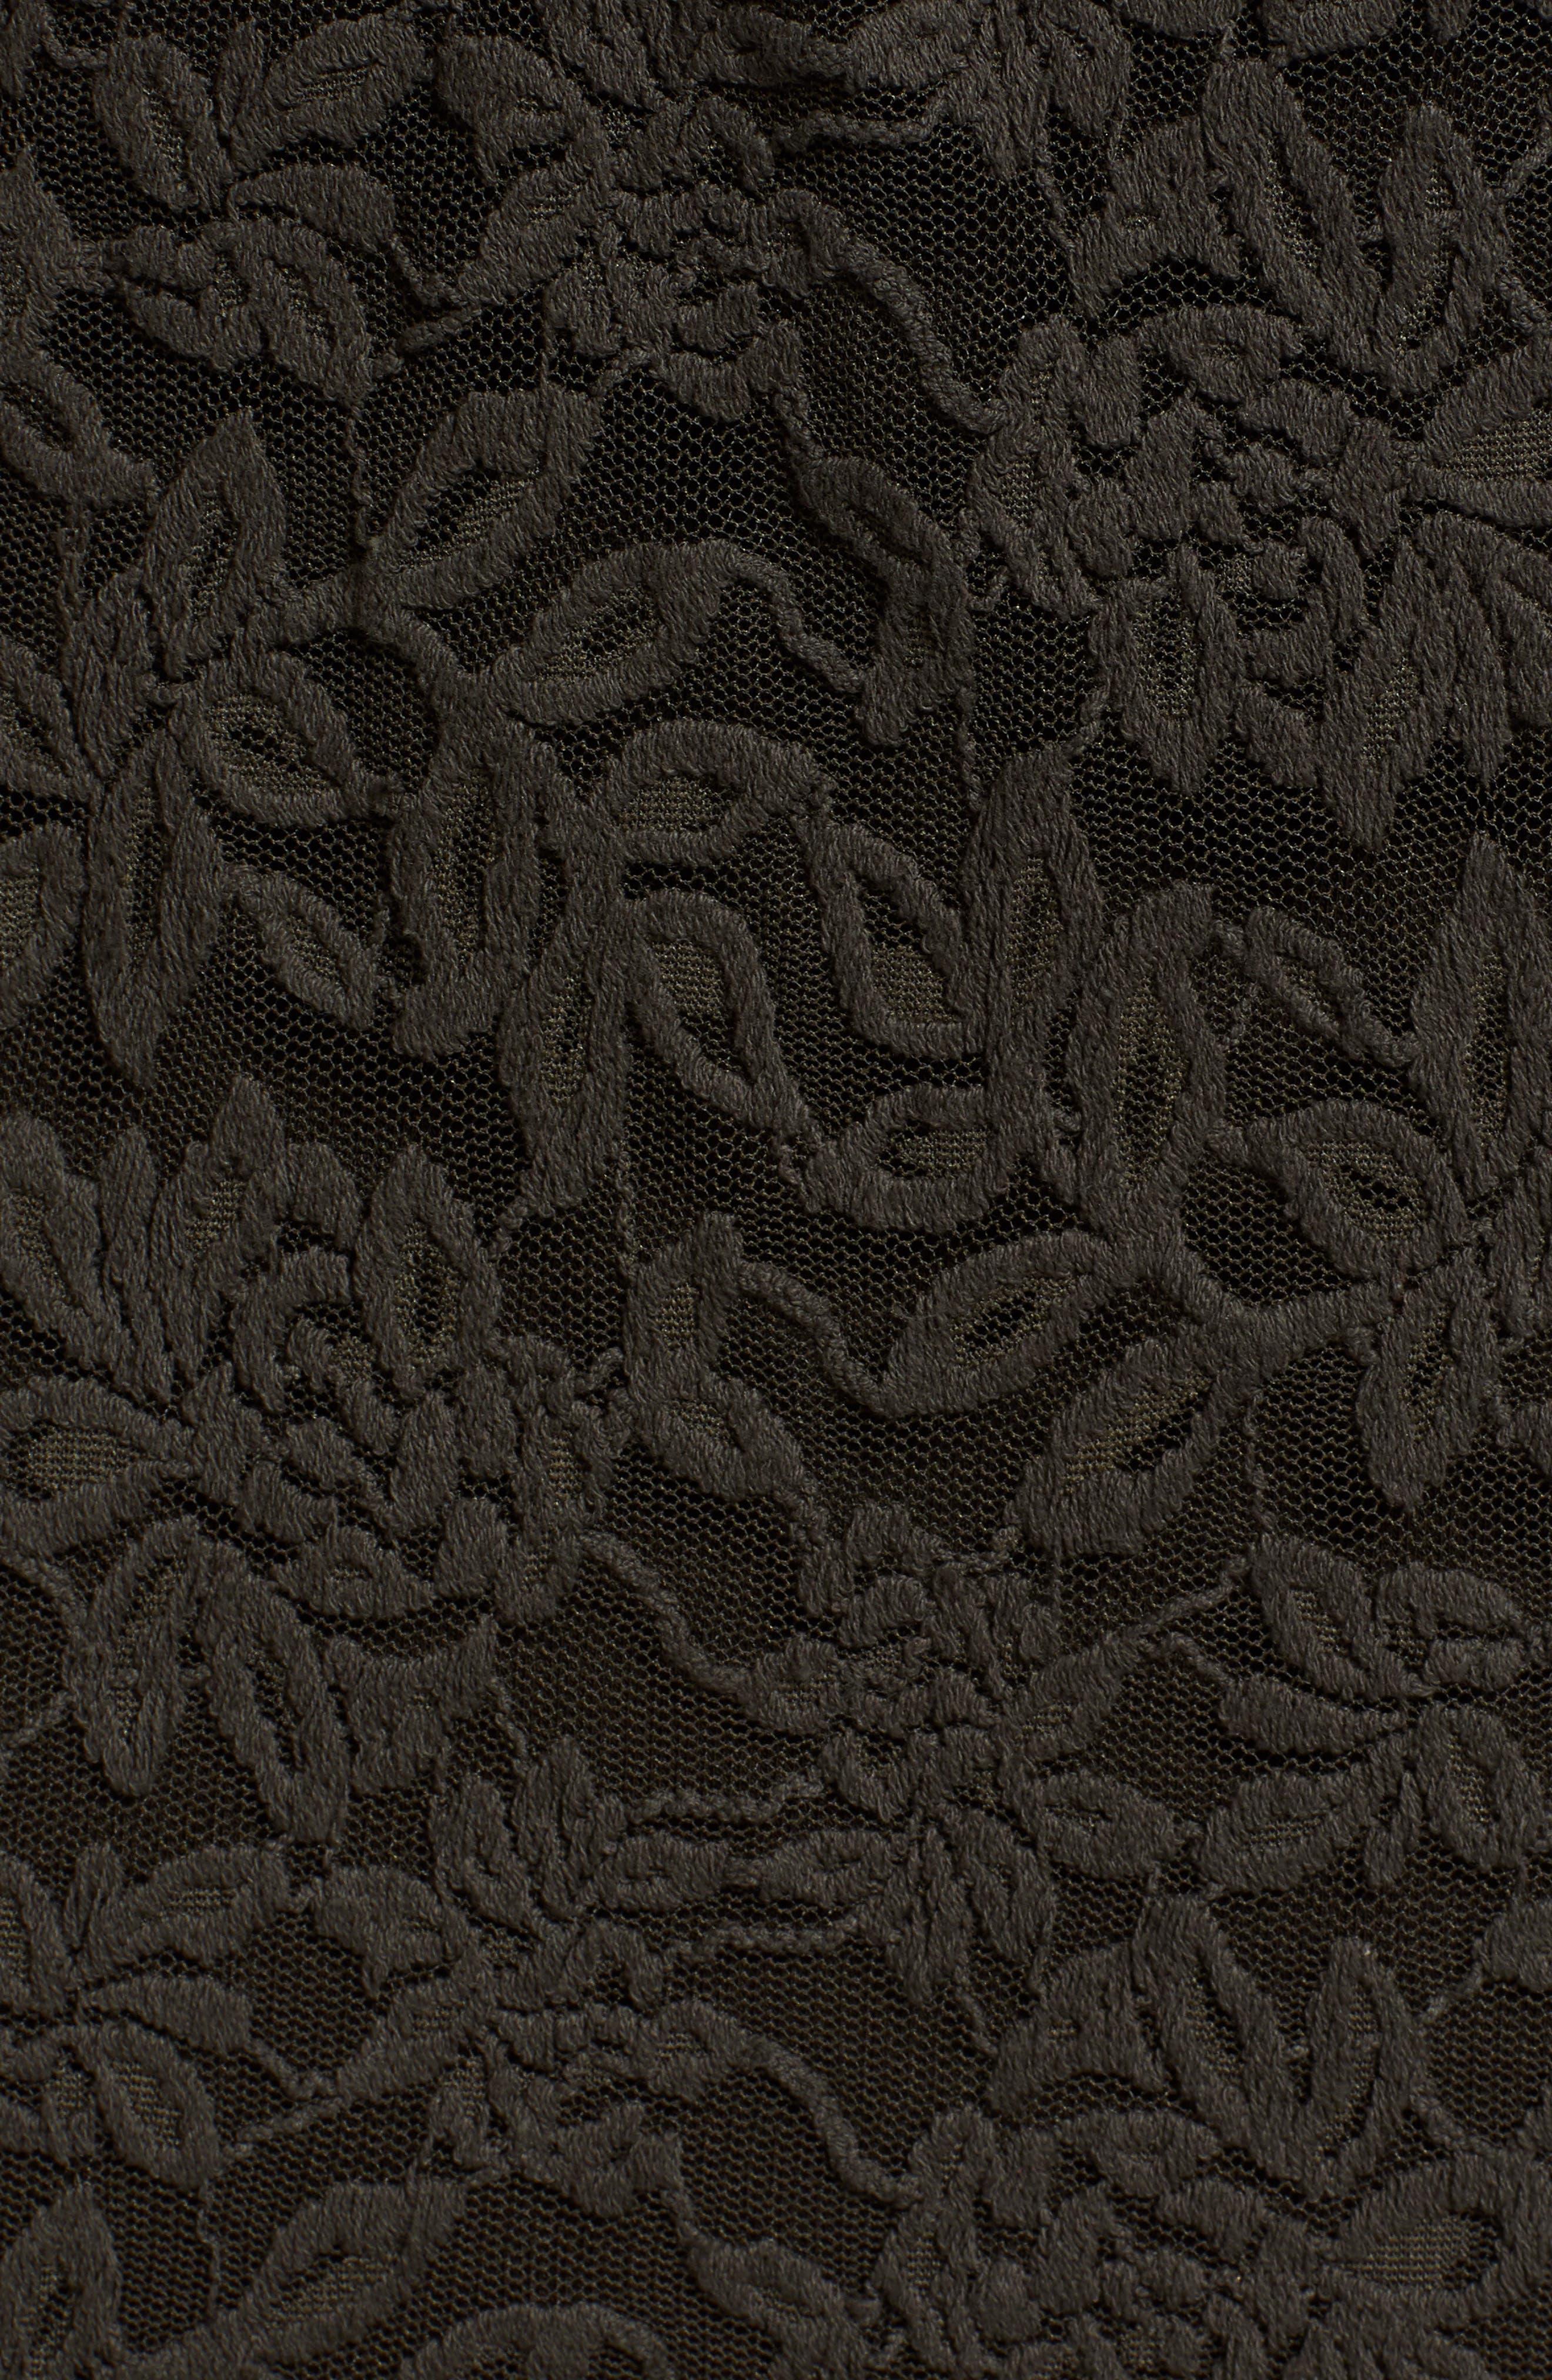 ROSEMUNDE, Delicia Scallop Detail Cotton Blend Lace Dress, Alternate thumbnail 6, color, DARK FOREST